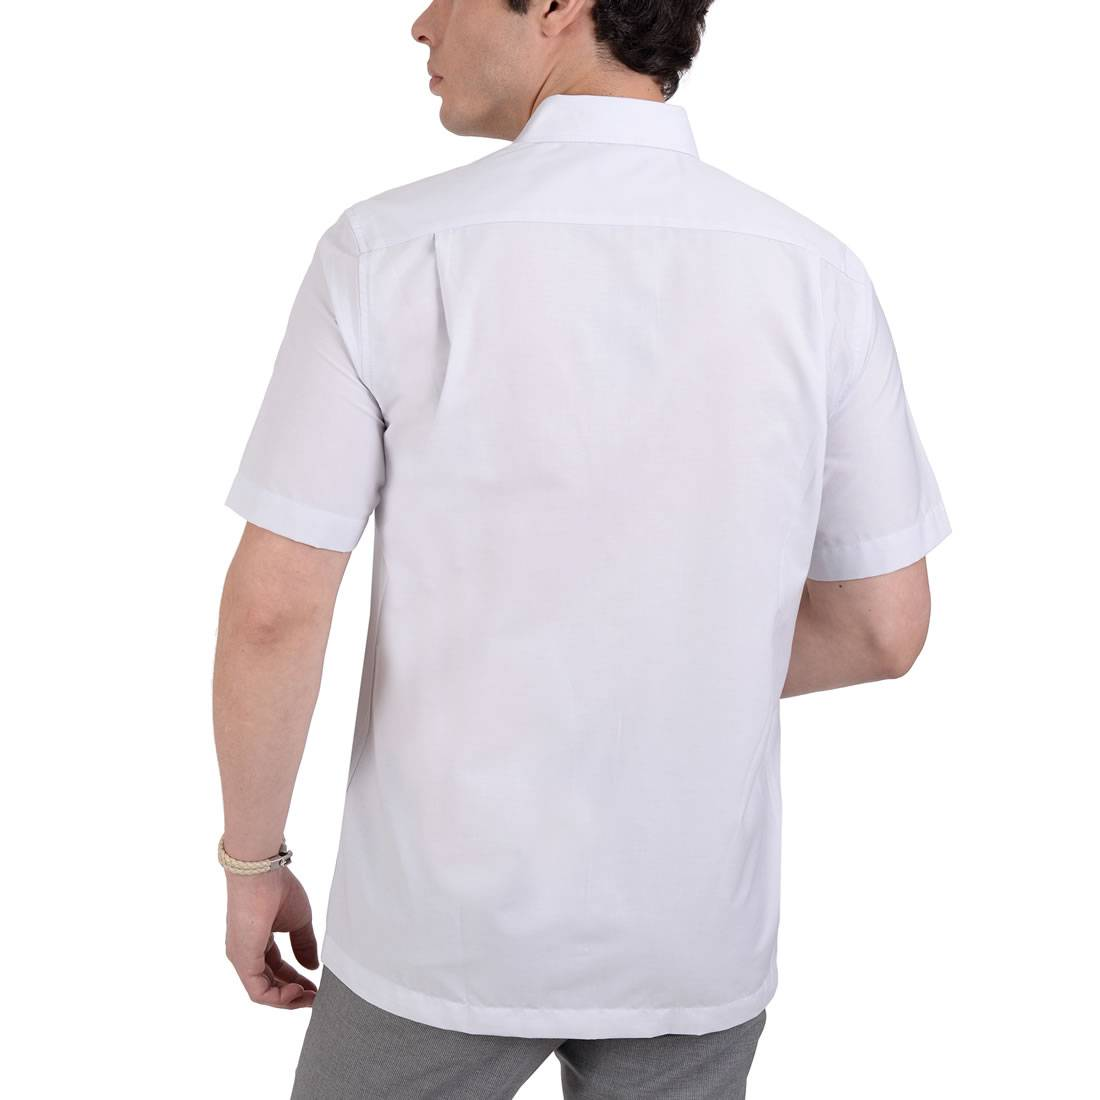 042379432106-03-Camisa-Casual-Manga-Corta-Classic-Fit-Gris-yale